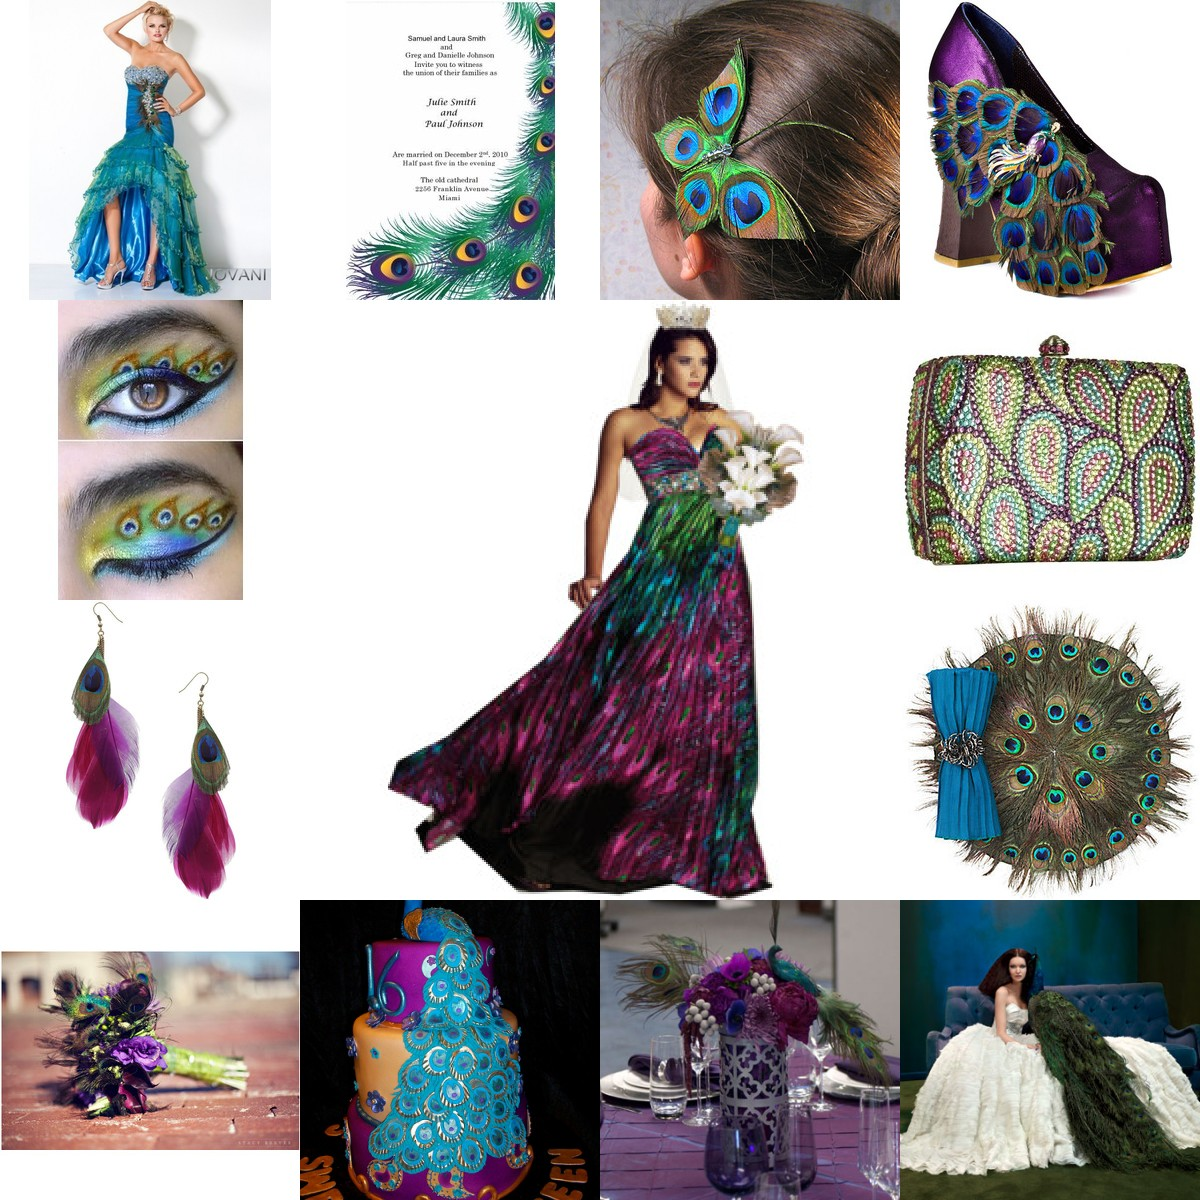 Www.WEDDINGCANDYNOW: When Peacock Is The Wedding Theme